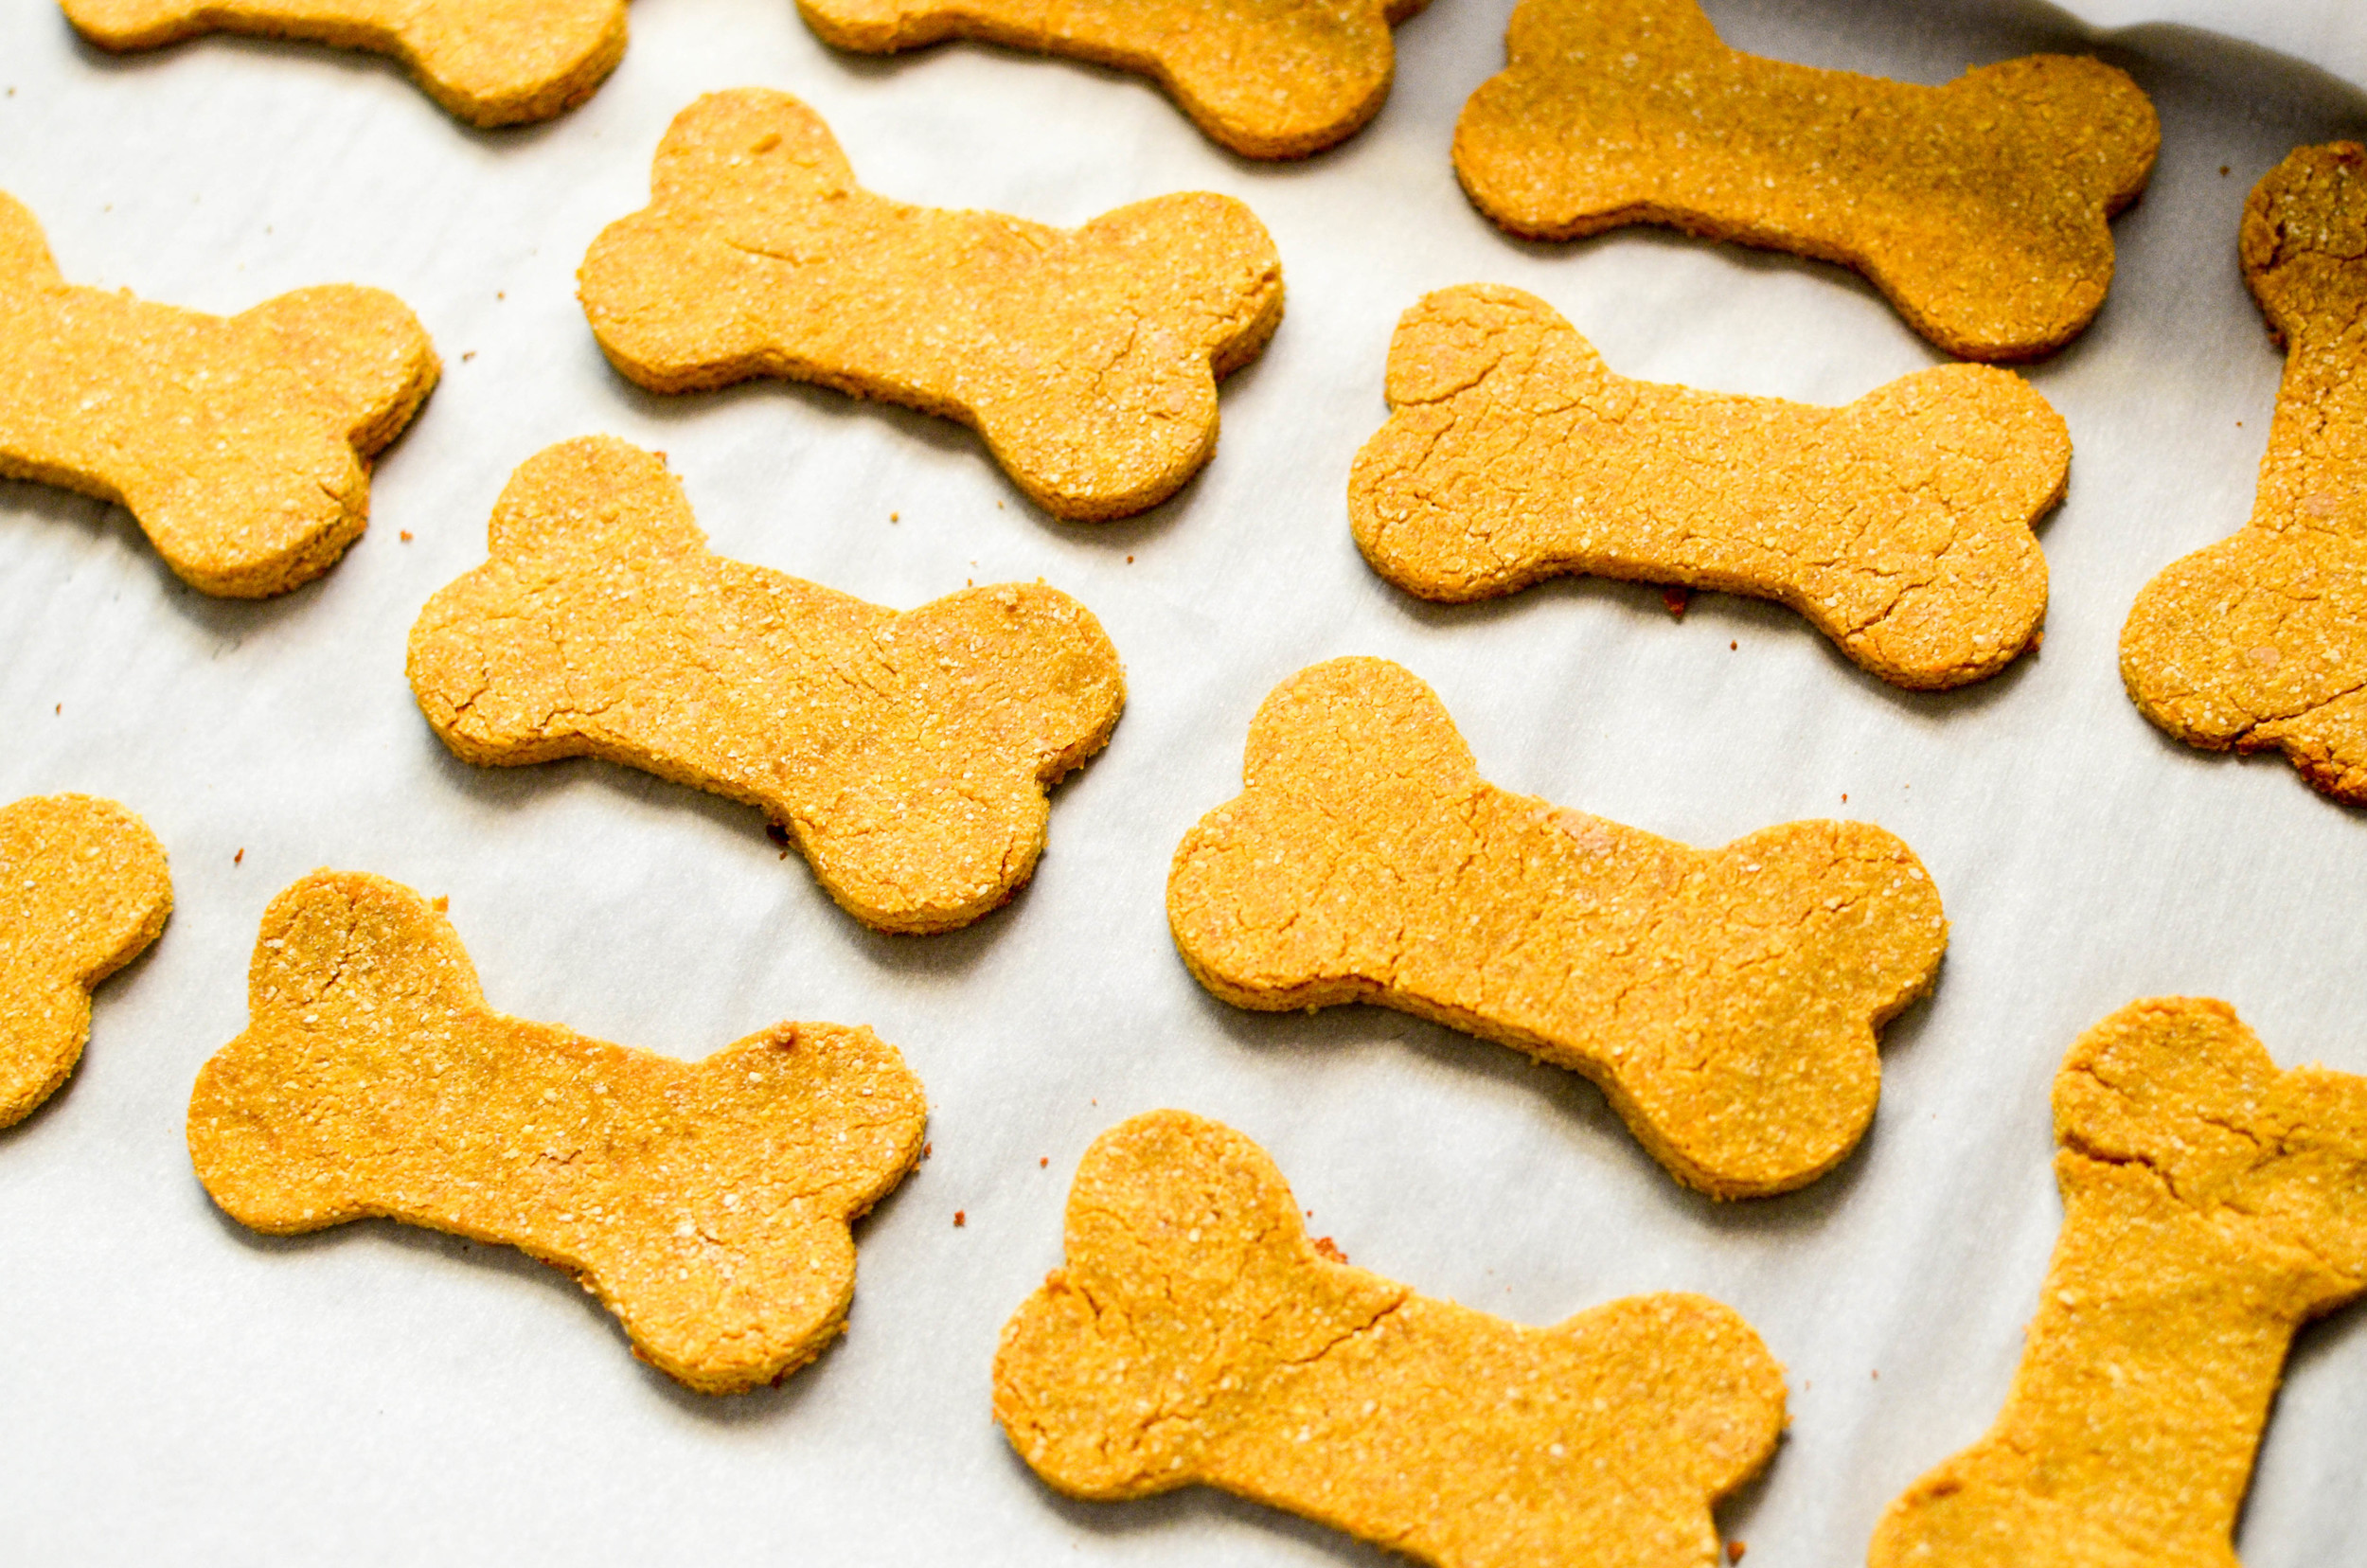 Dog Treats Organic 3 Ingredients Grain Free Tiffany Lieu